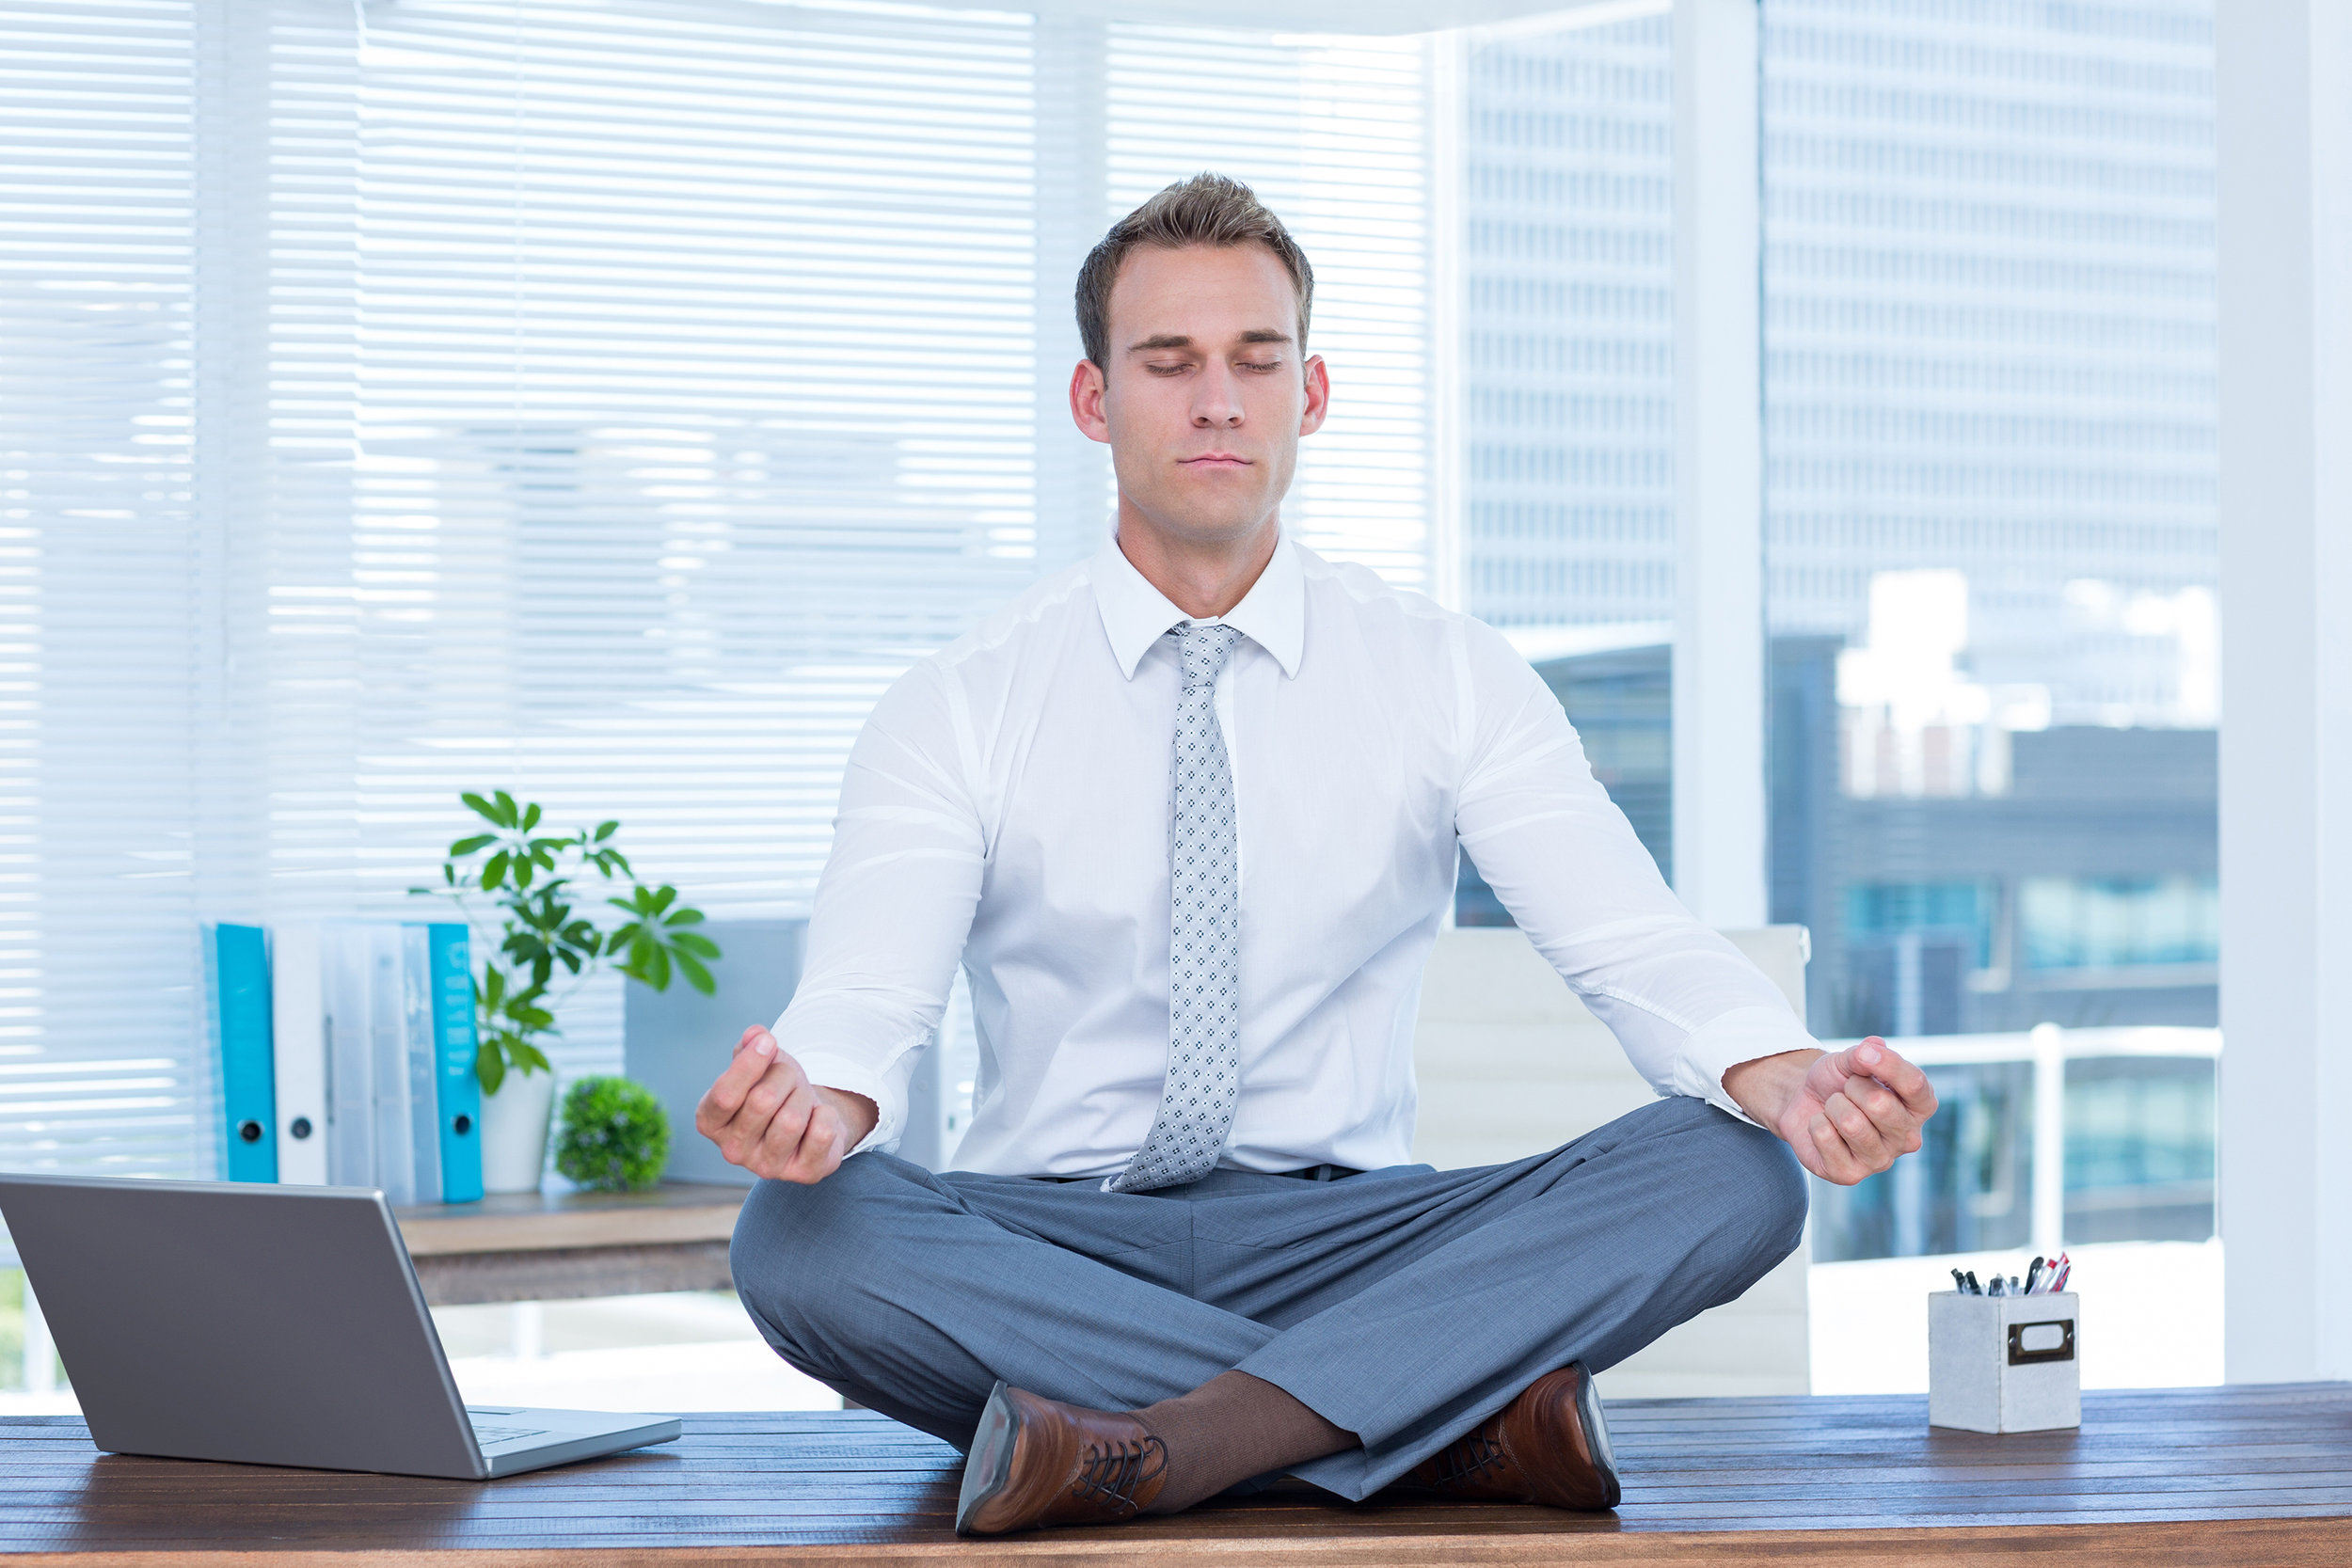 Zen businessman doing yoga meditation